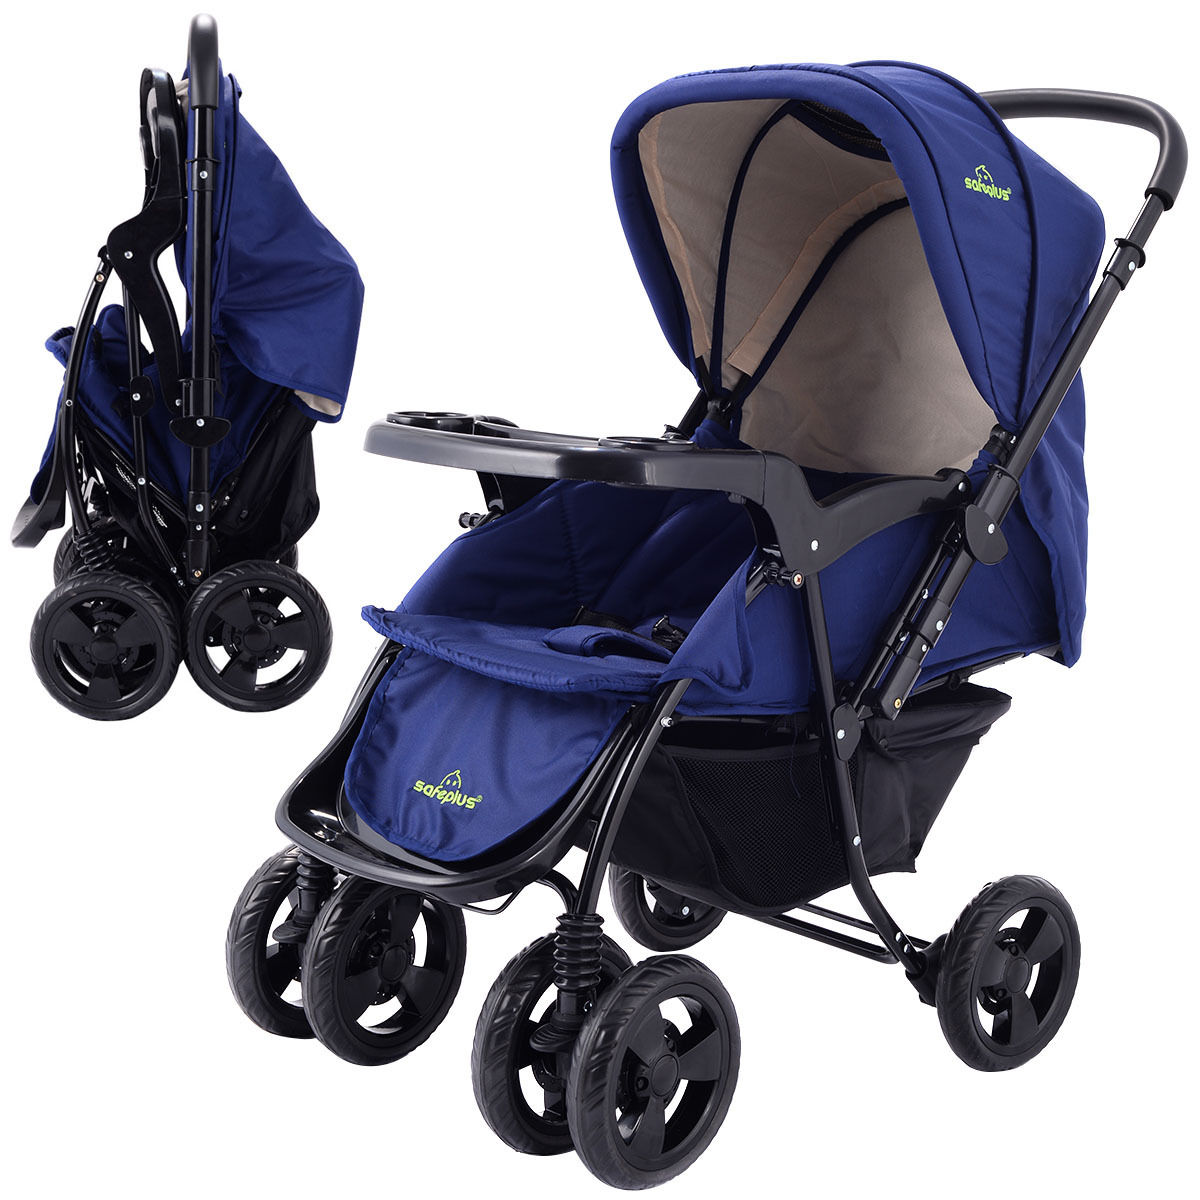 Best Travel Buggy For Newborn